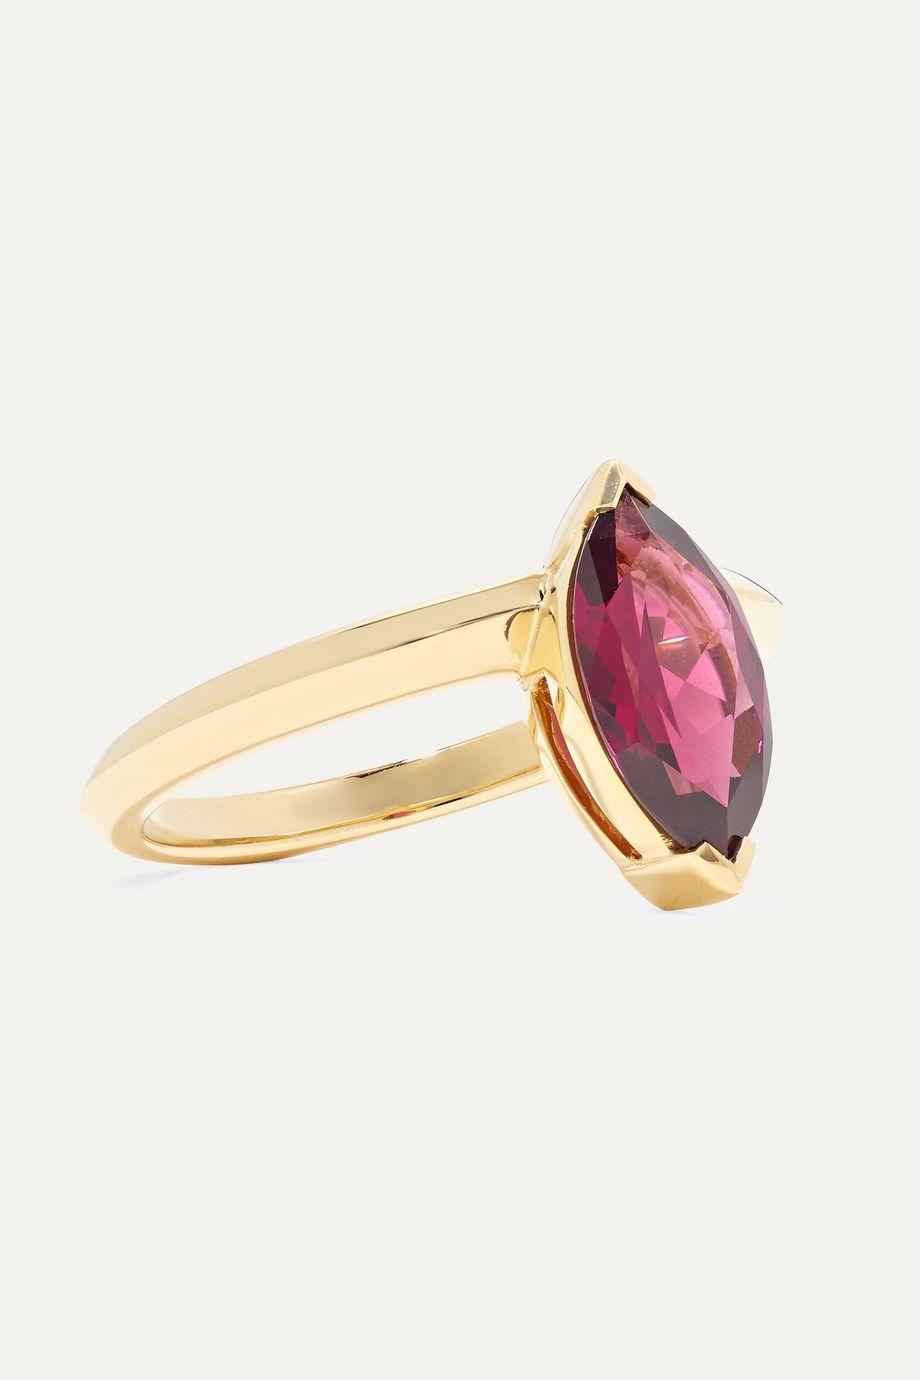 Stephen Webster Jitterbug 18-karat rhodolite ring